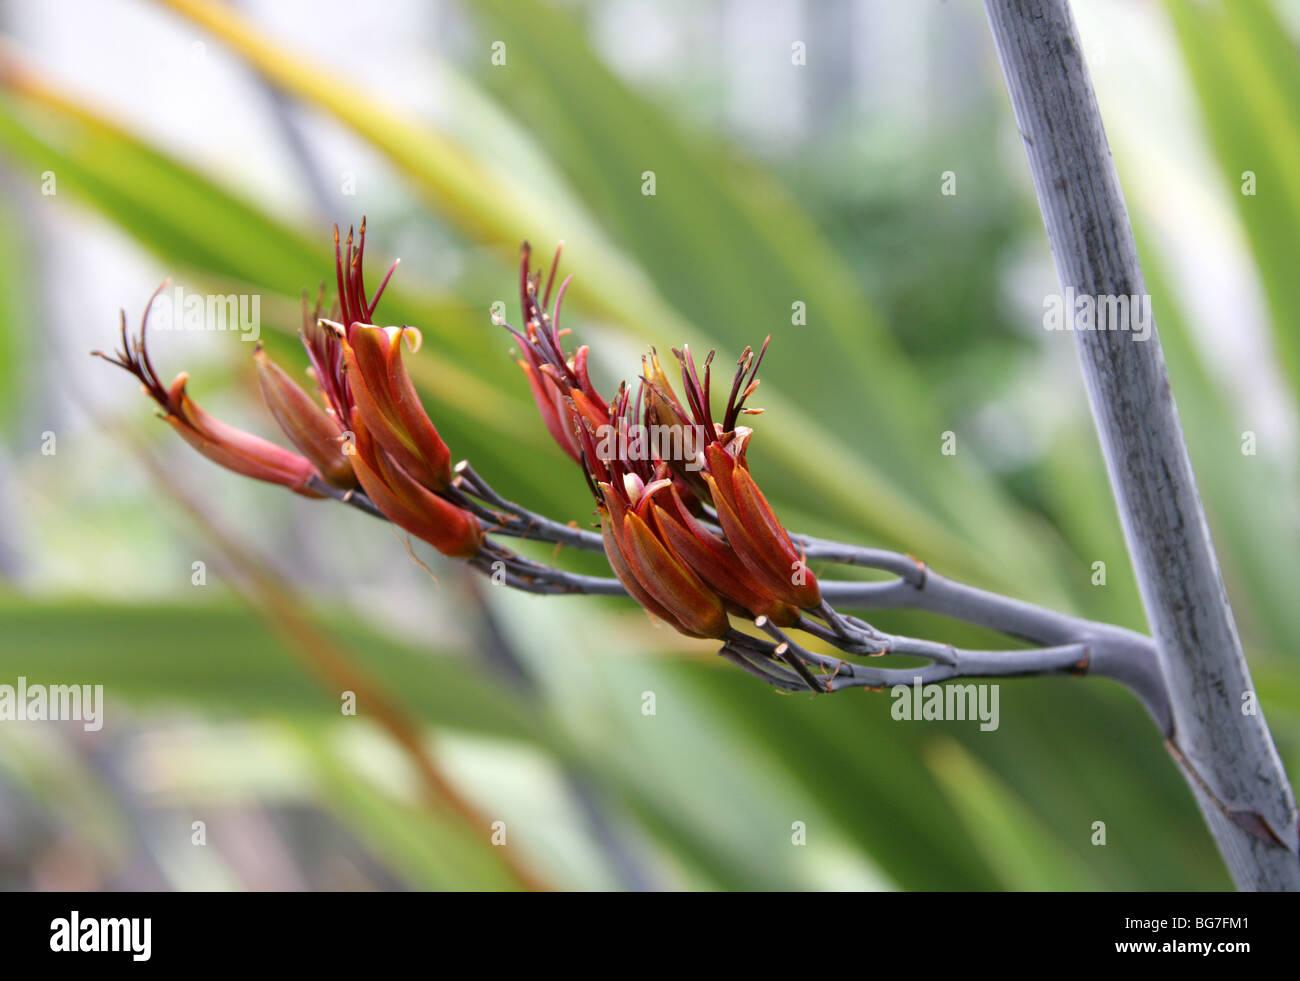 Neuseeland-Flachs, Phormium Tenax, Hemerocallidaceae, Agavaceae. Stockfoto